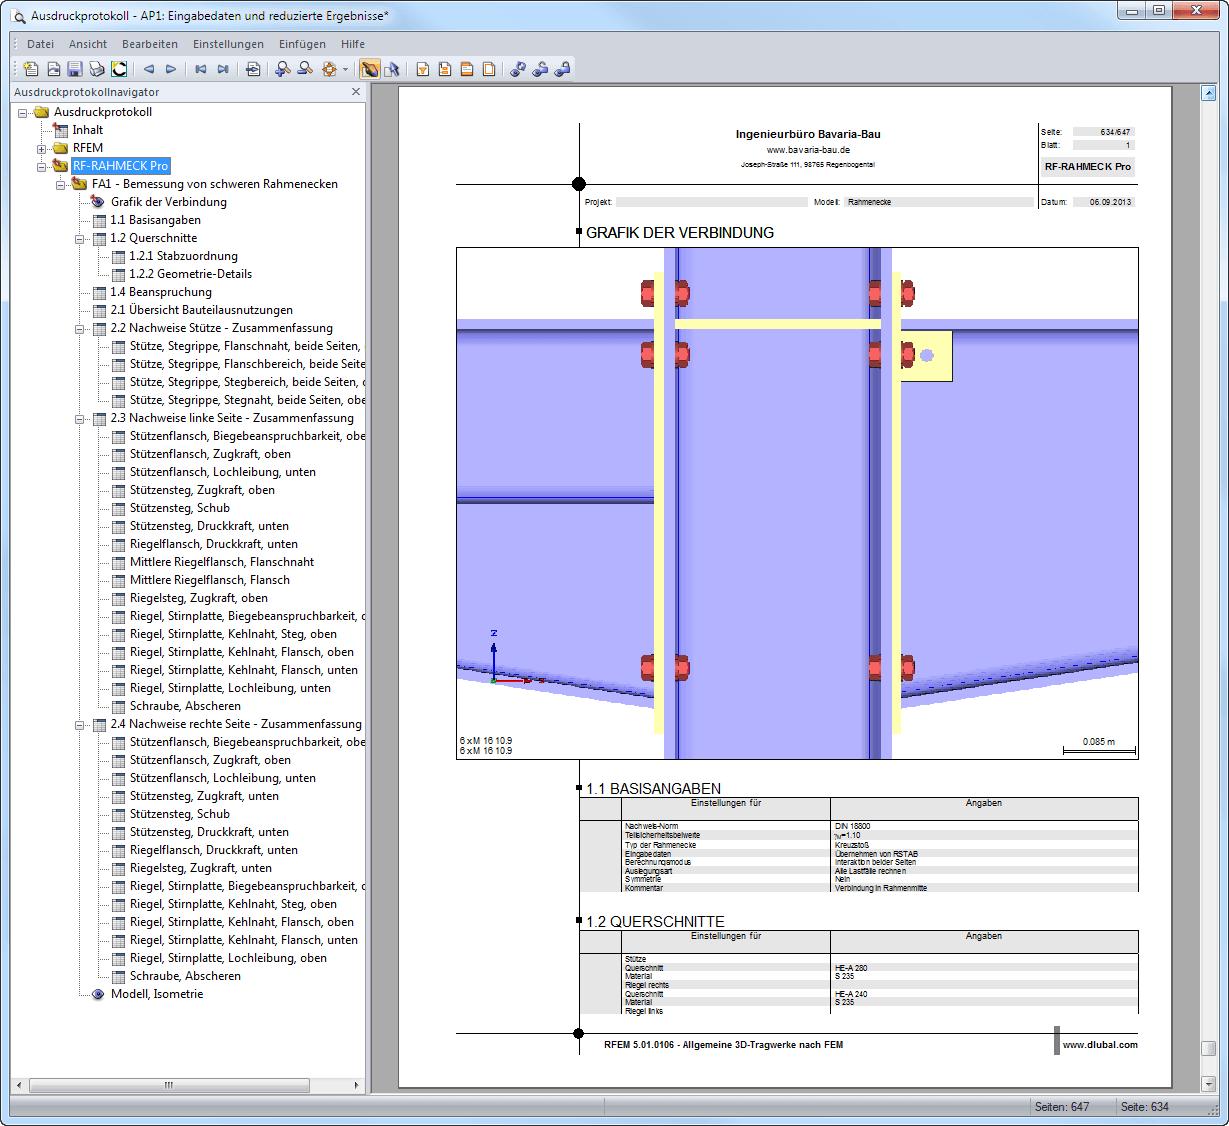 Rahmeck pro eckverbindungen f r rahmen nach ec 3 dlubal for Statik rahmen berechnen